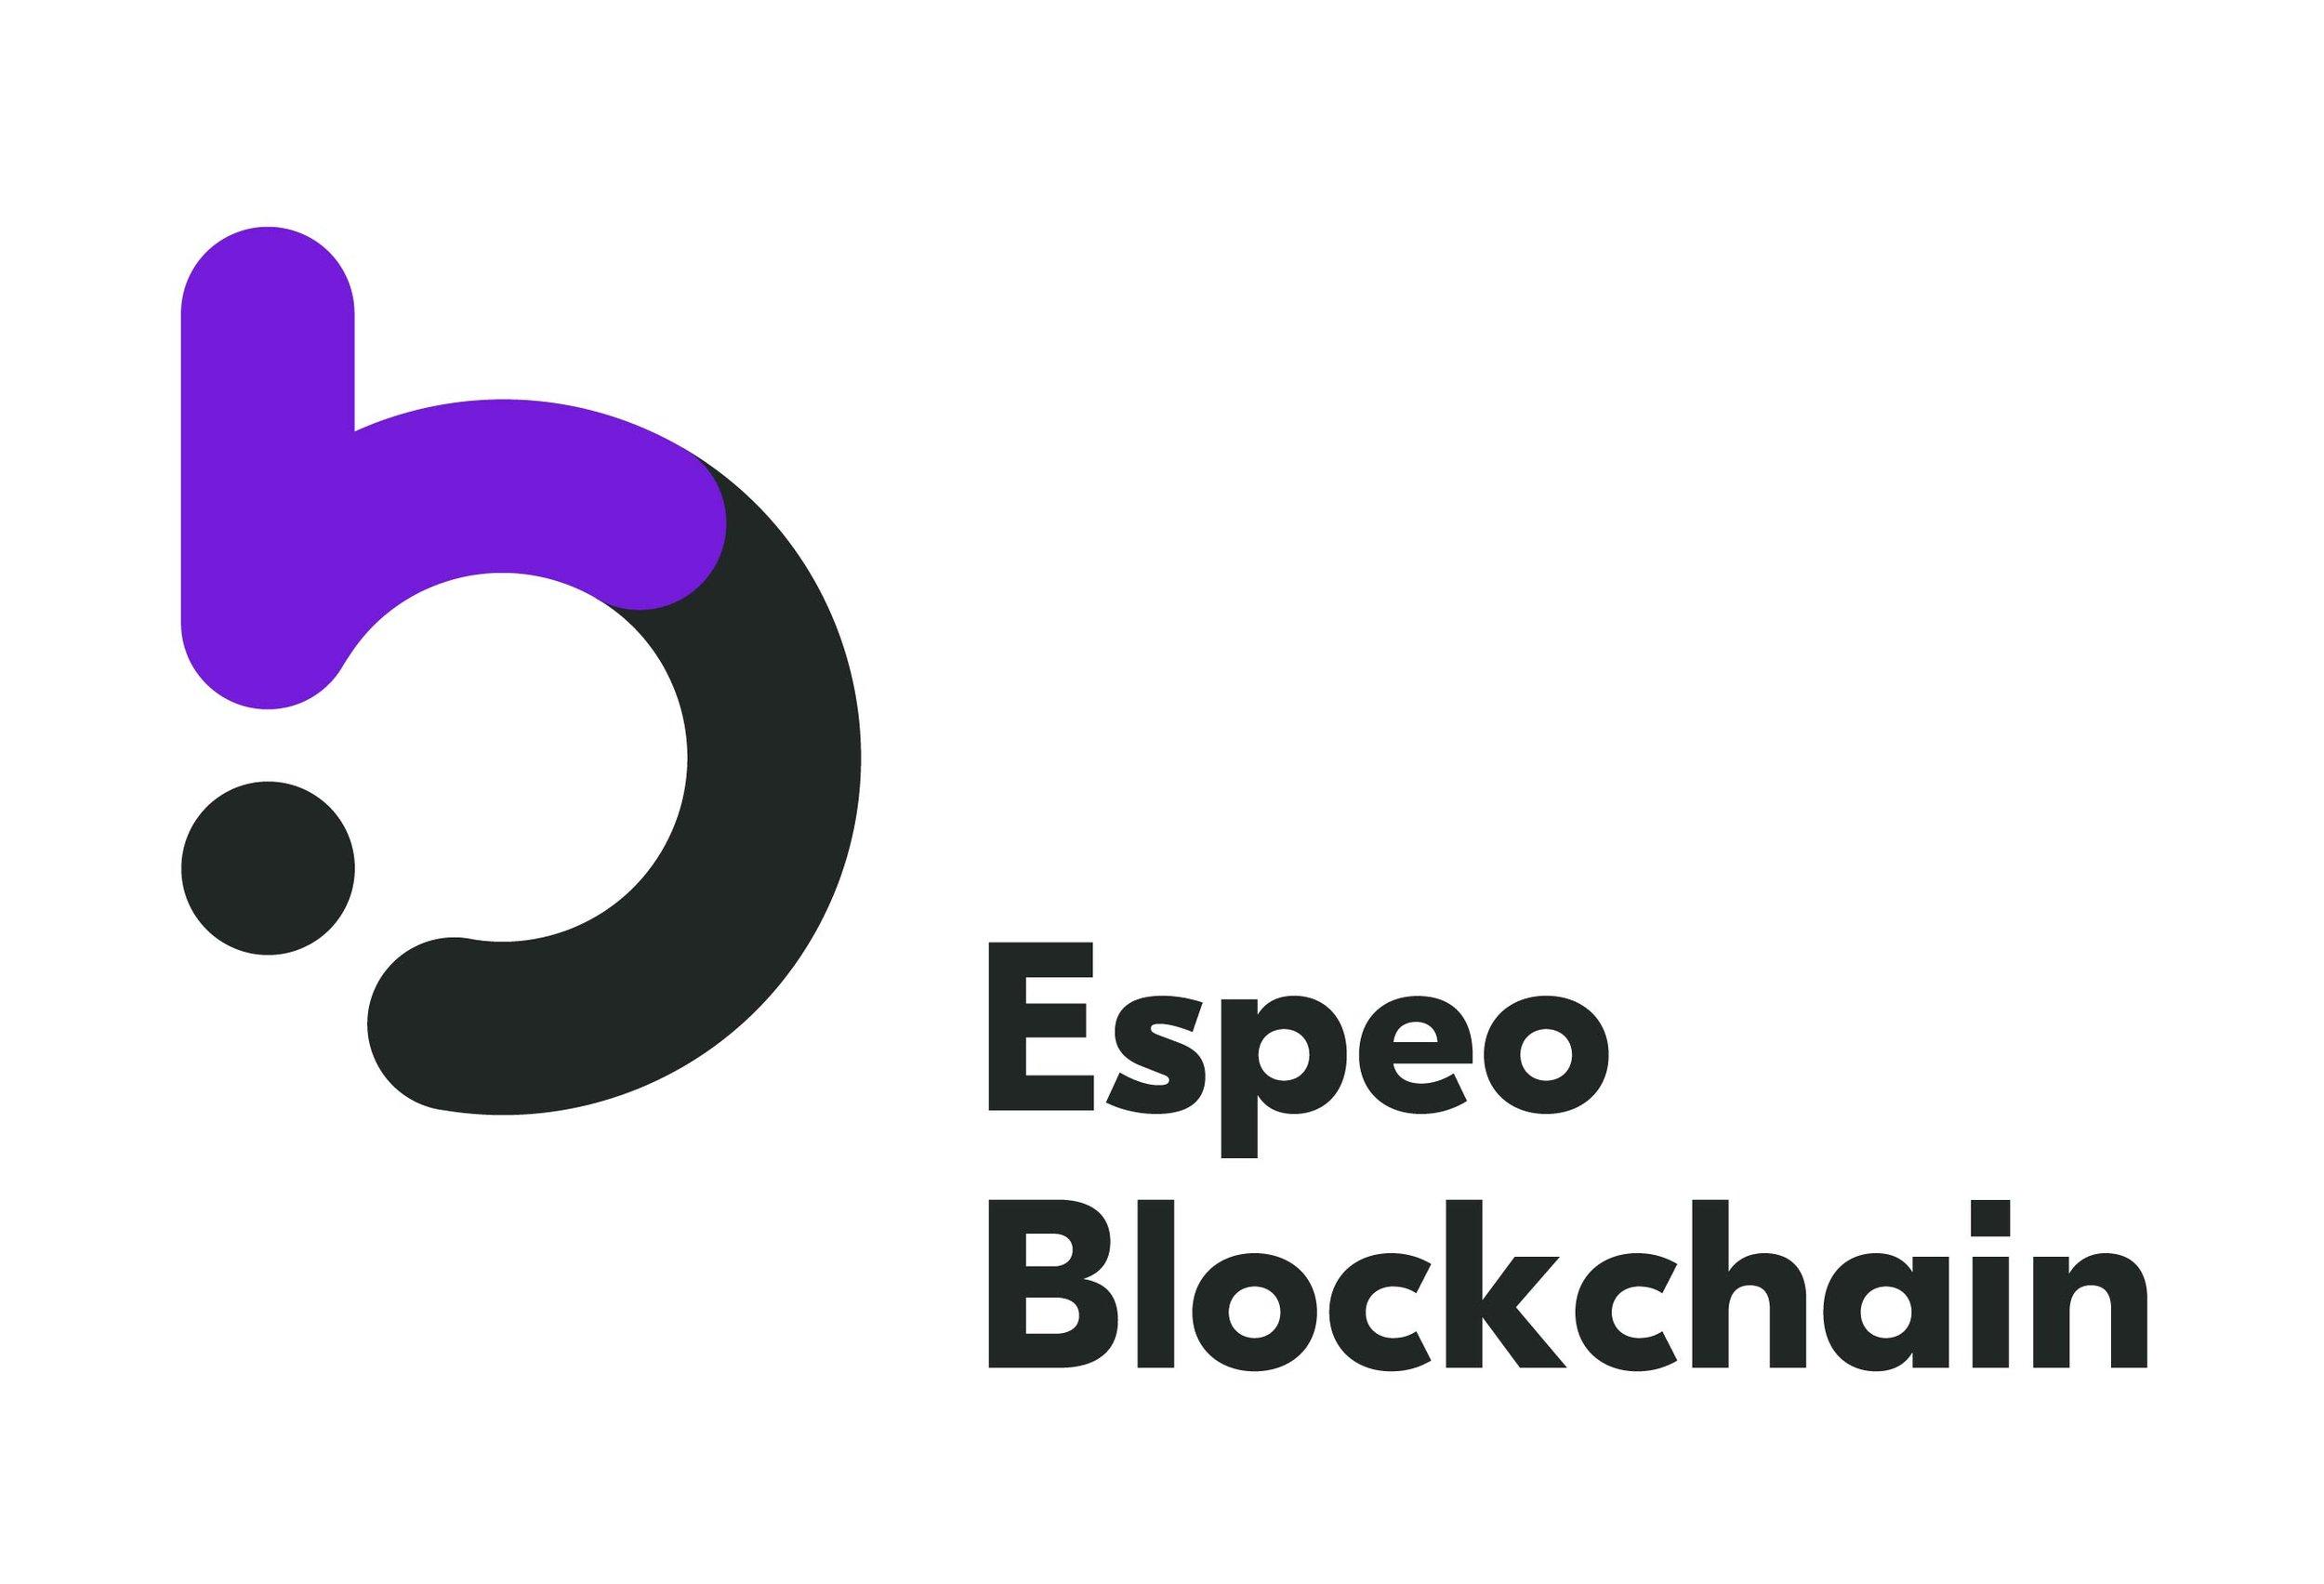 logo blockchain rgb 300dpi.jpg